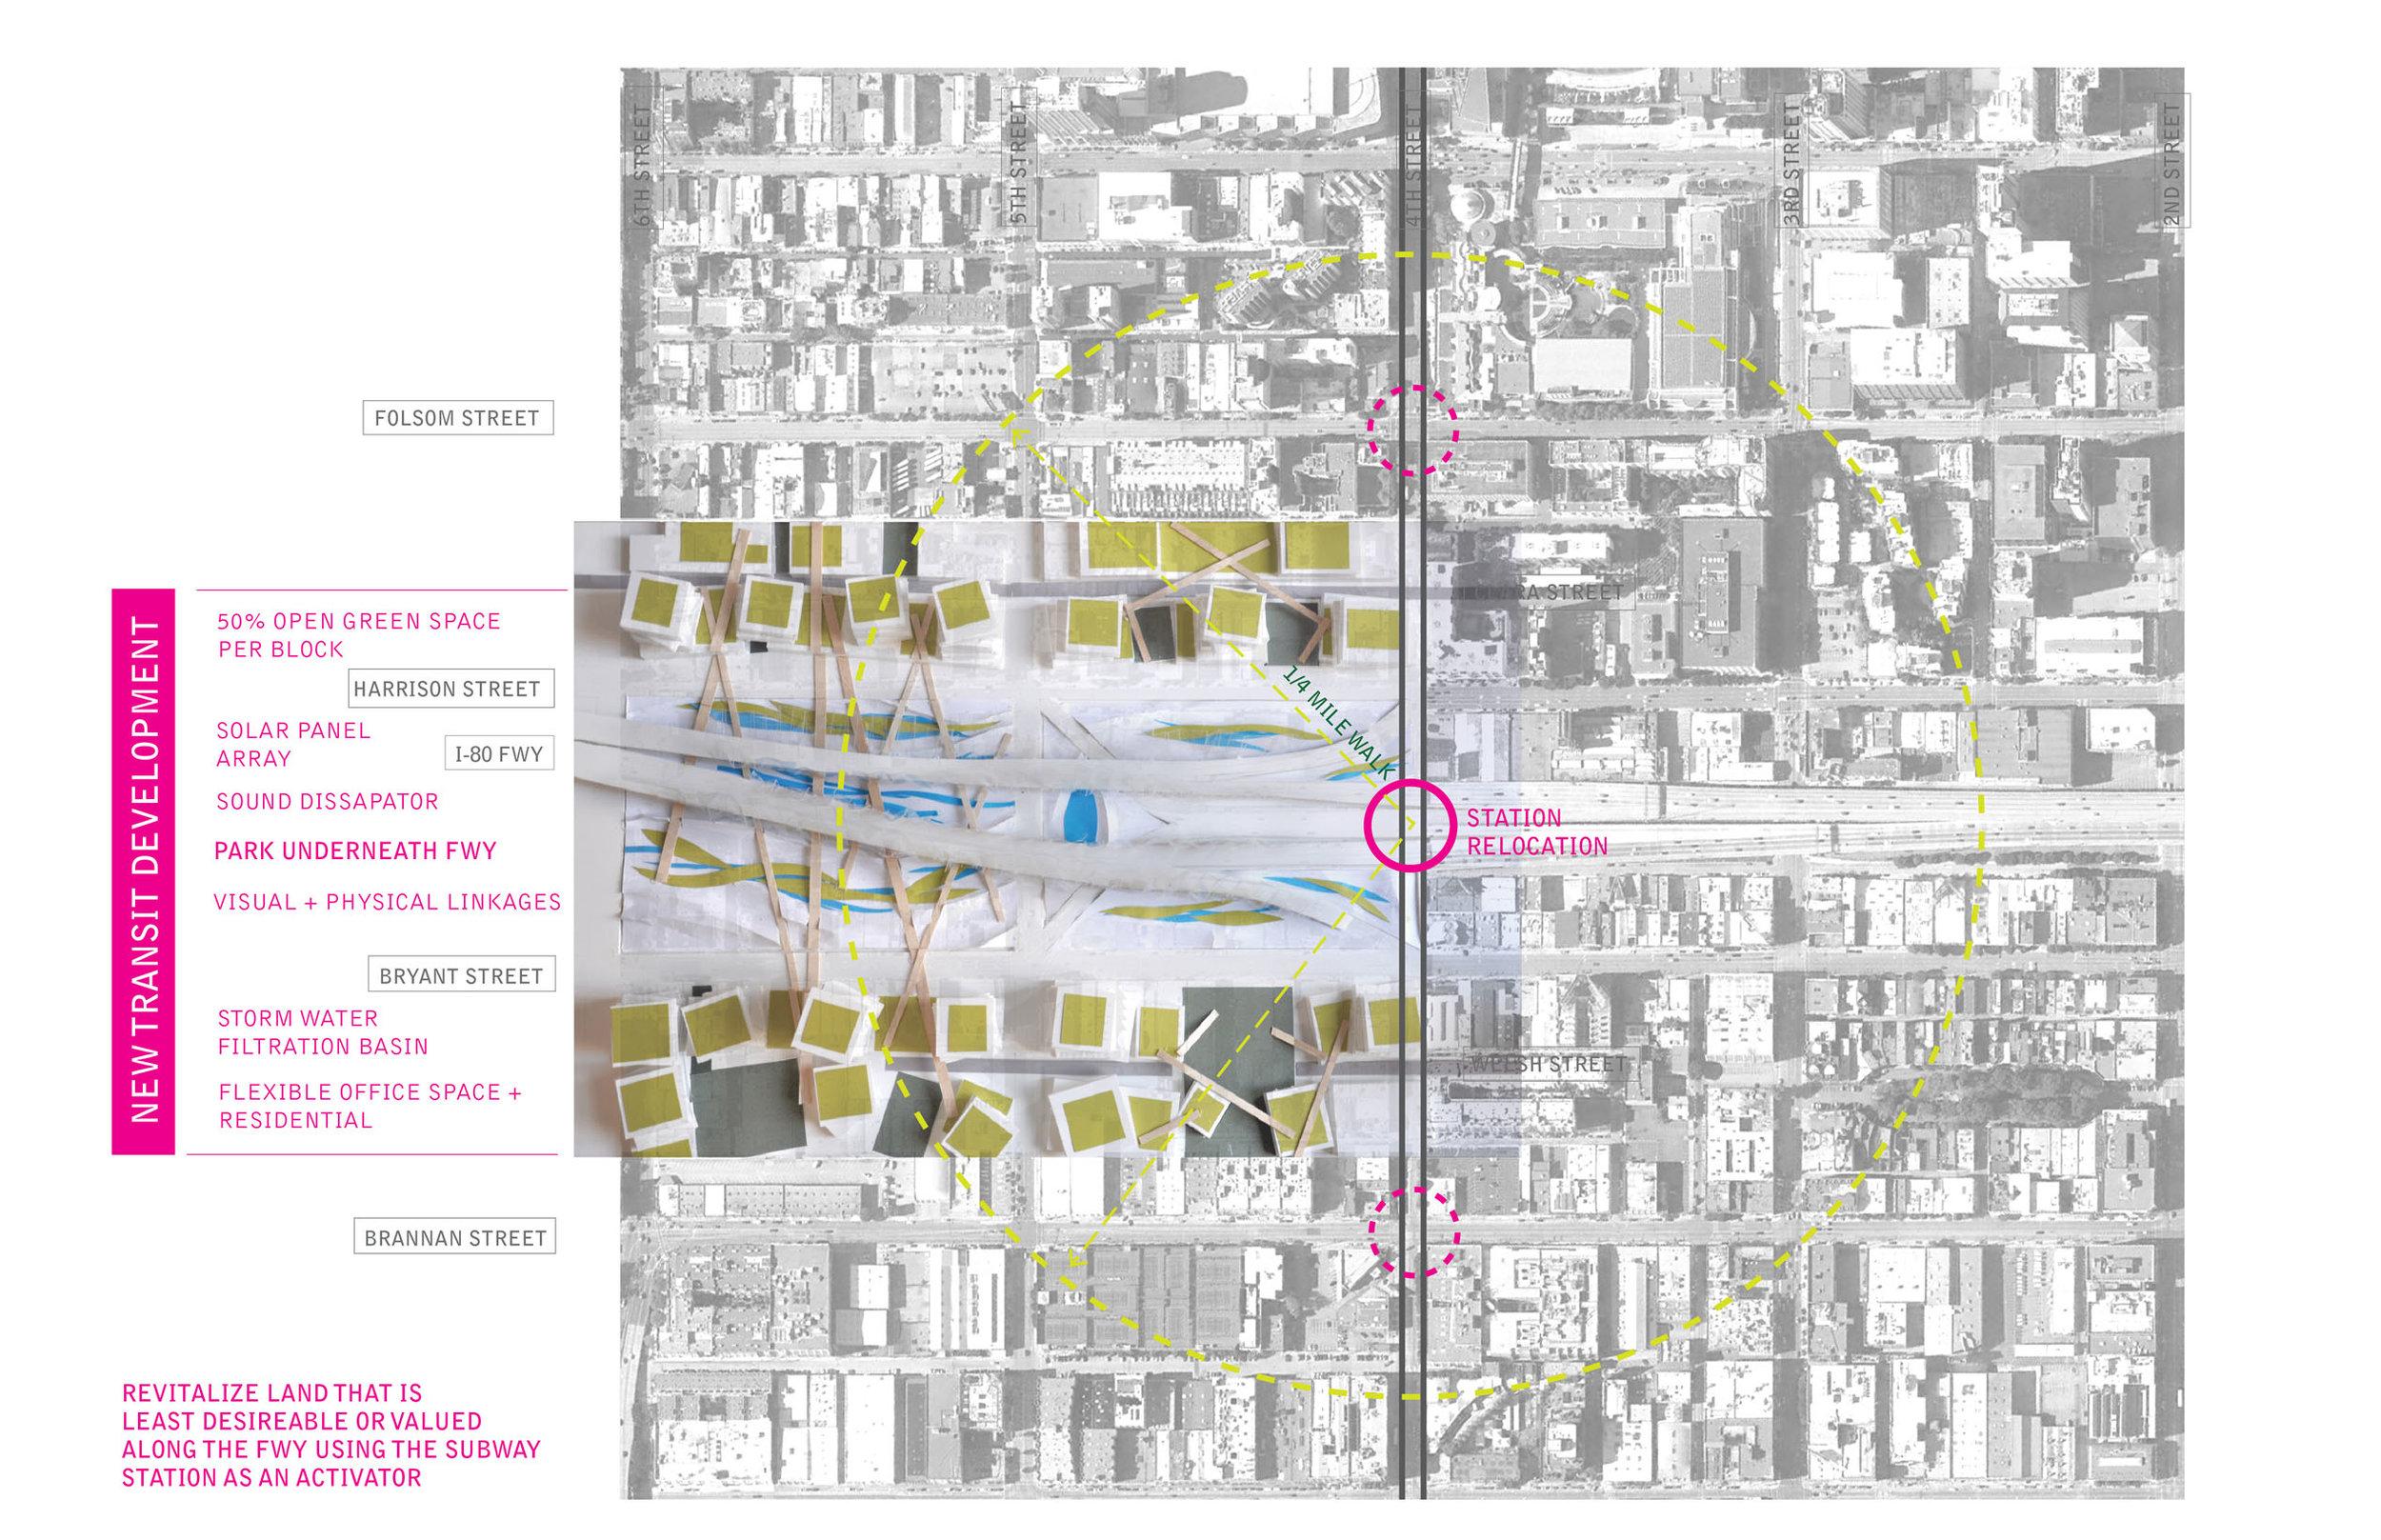 TINA CHEE_landscape studio_conveyance siteplan.jpg